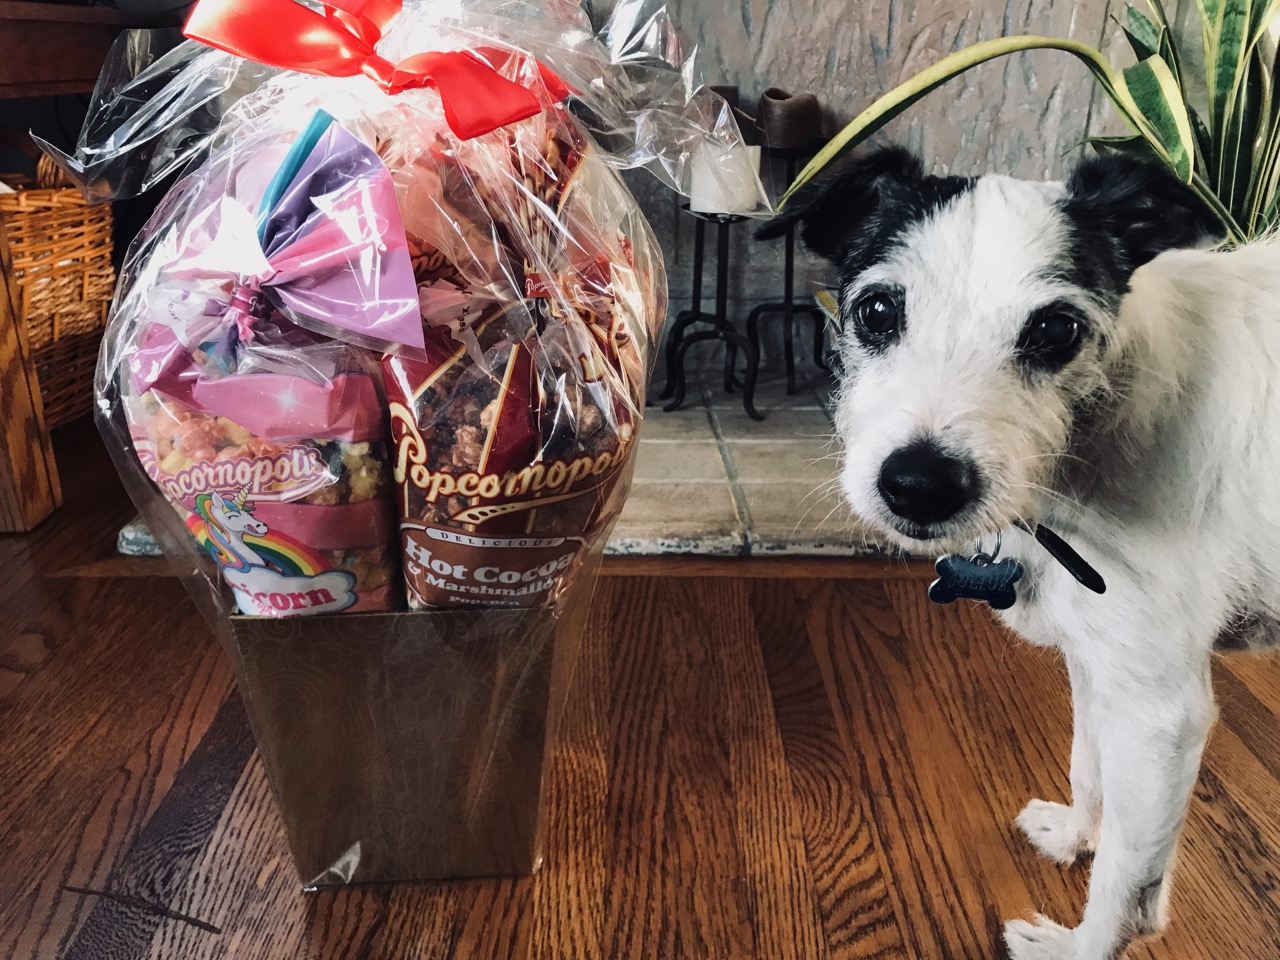 Popcornopolis-Gift-Basket.jpg